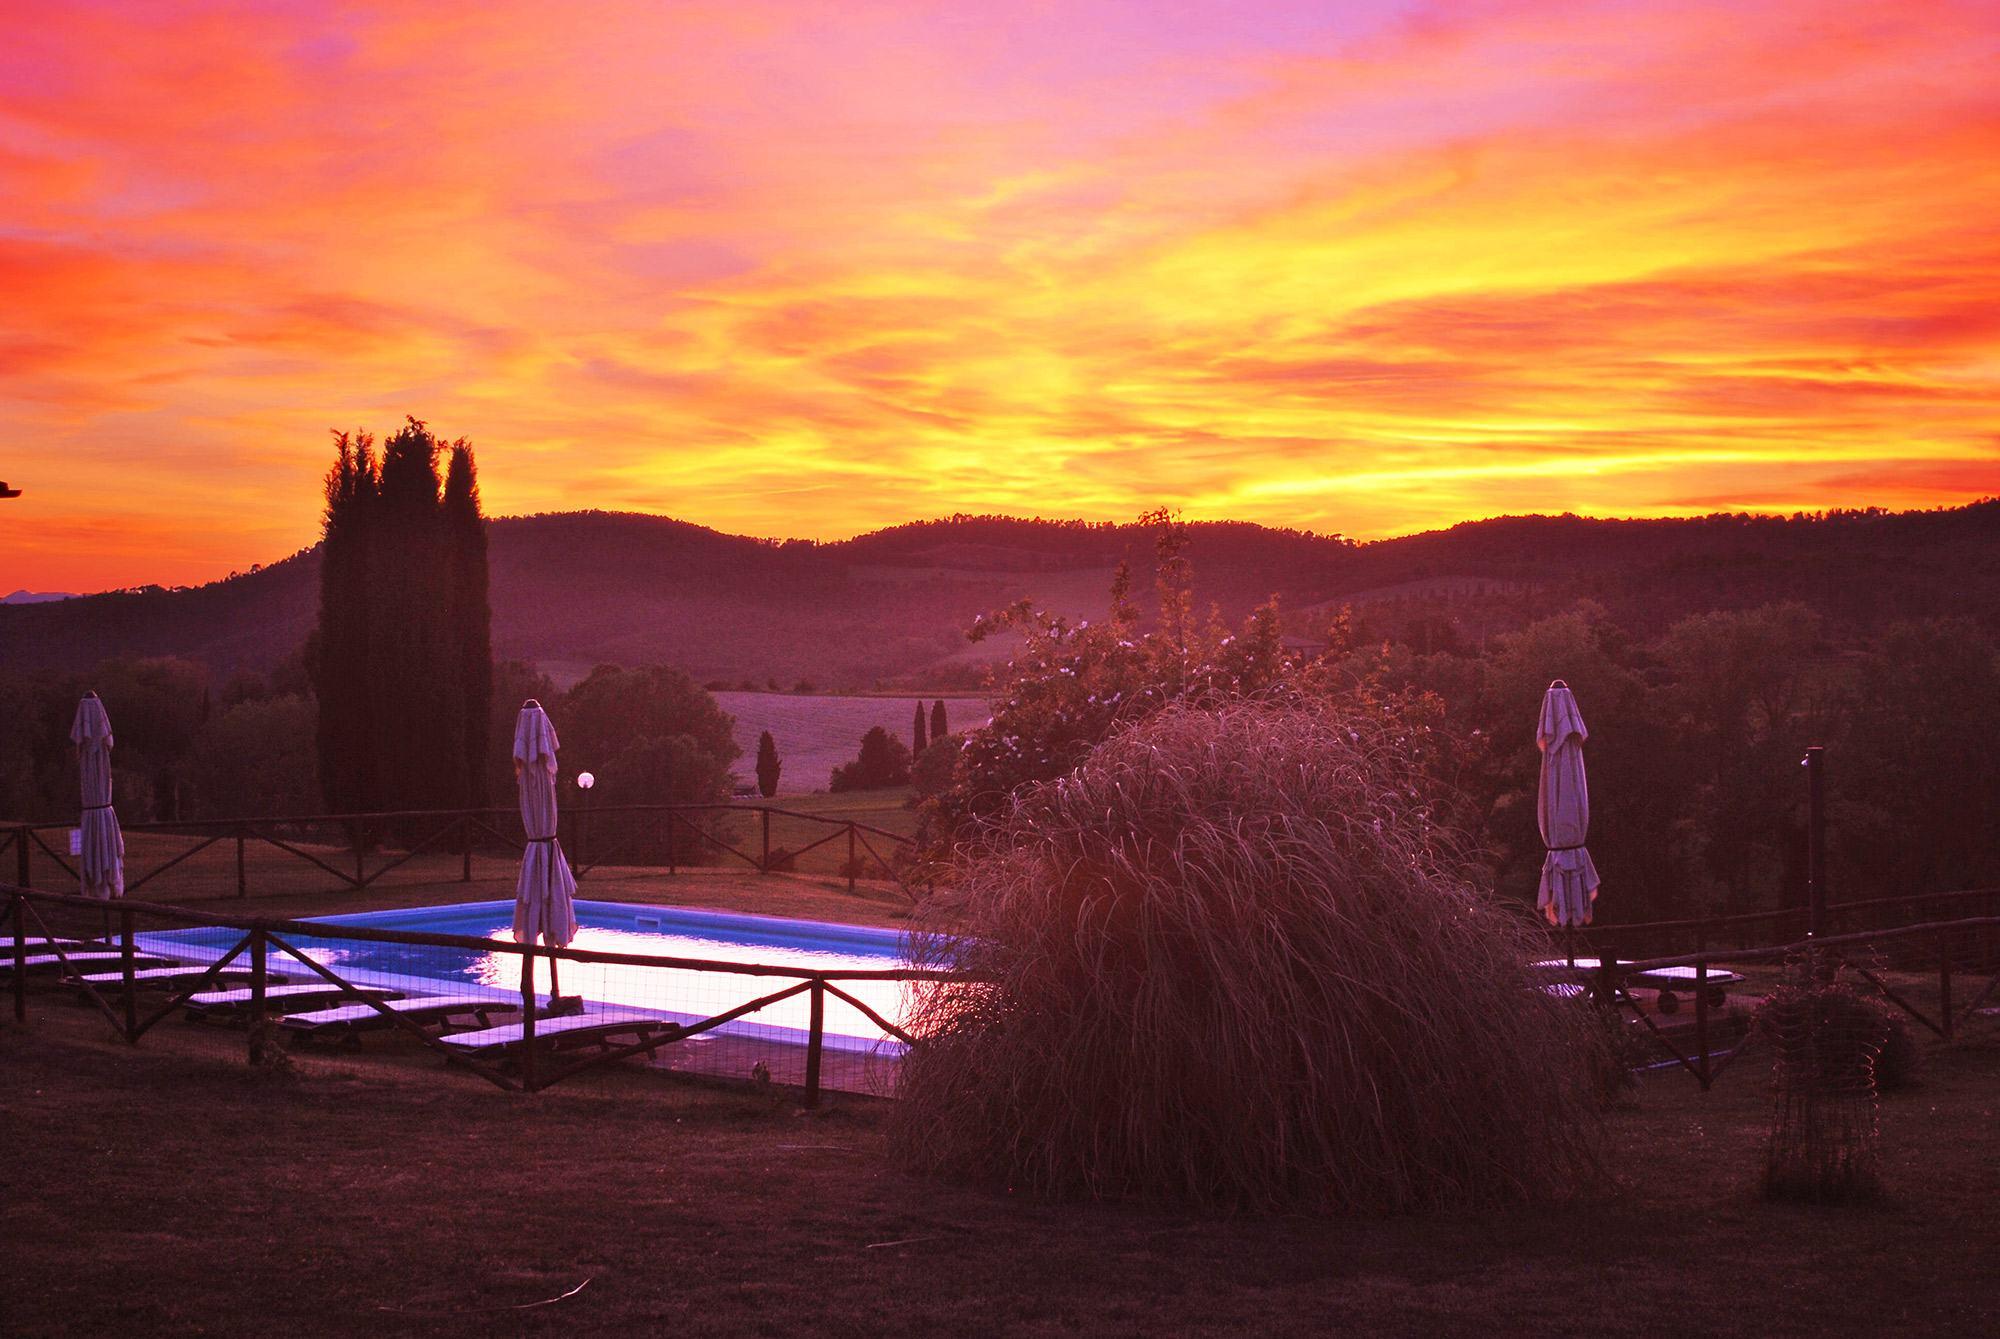 Villa con piscina in Toscana al TRAMONTO